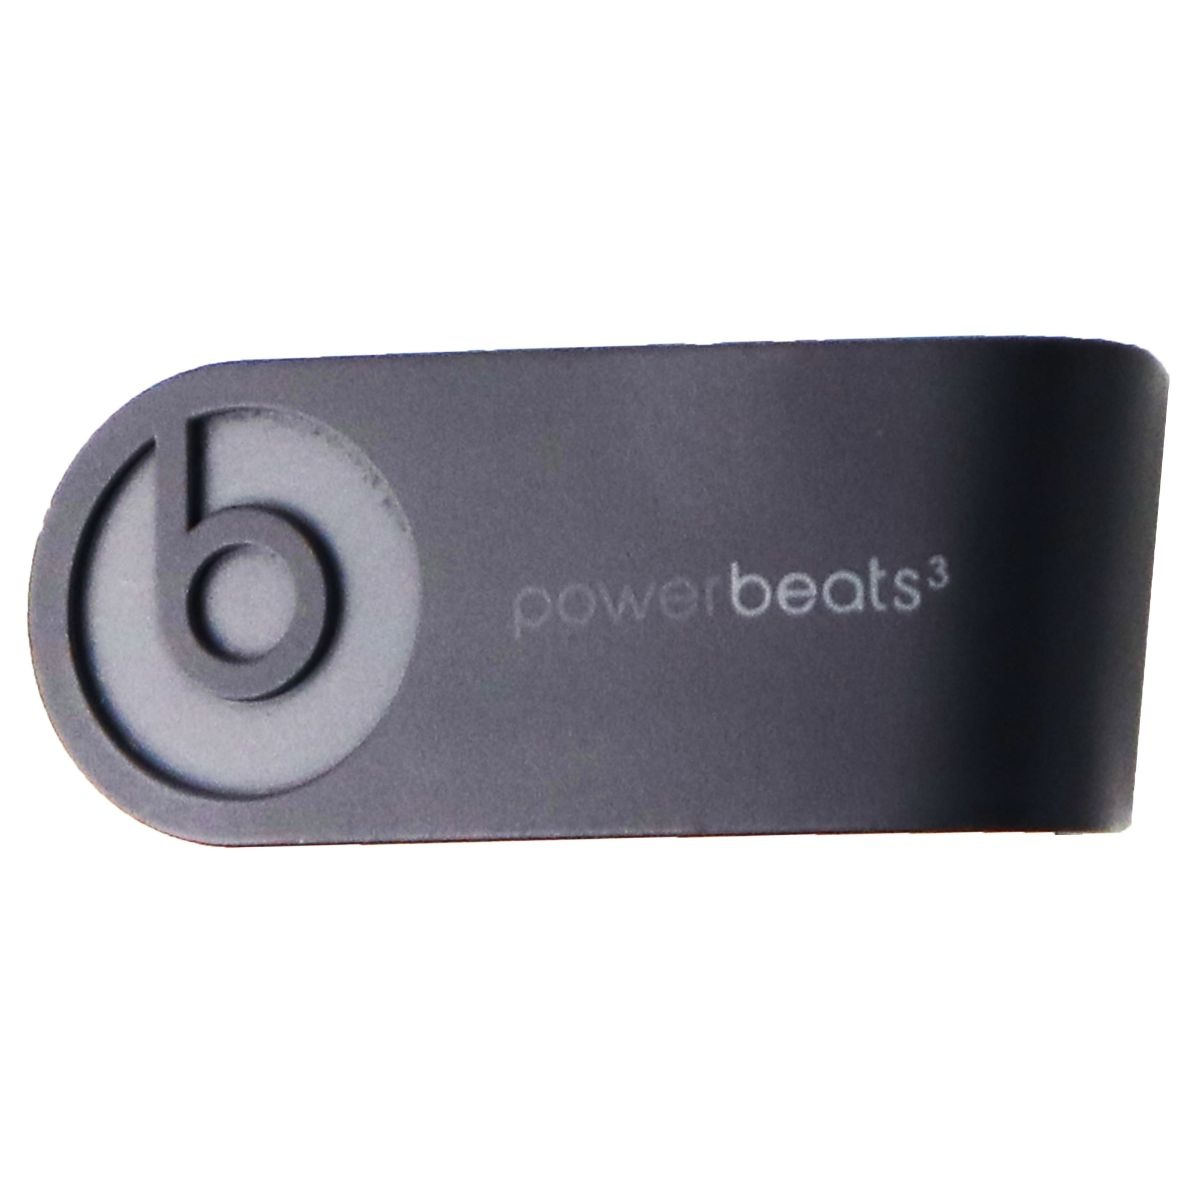 Genuine Power Beats 3 Replacement Right Speaker Housing Panel - Black